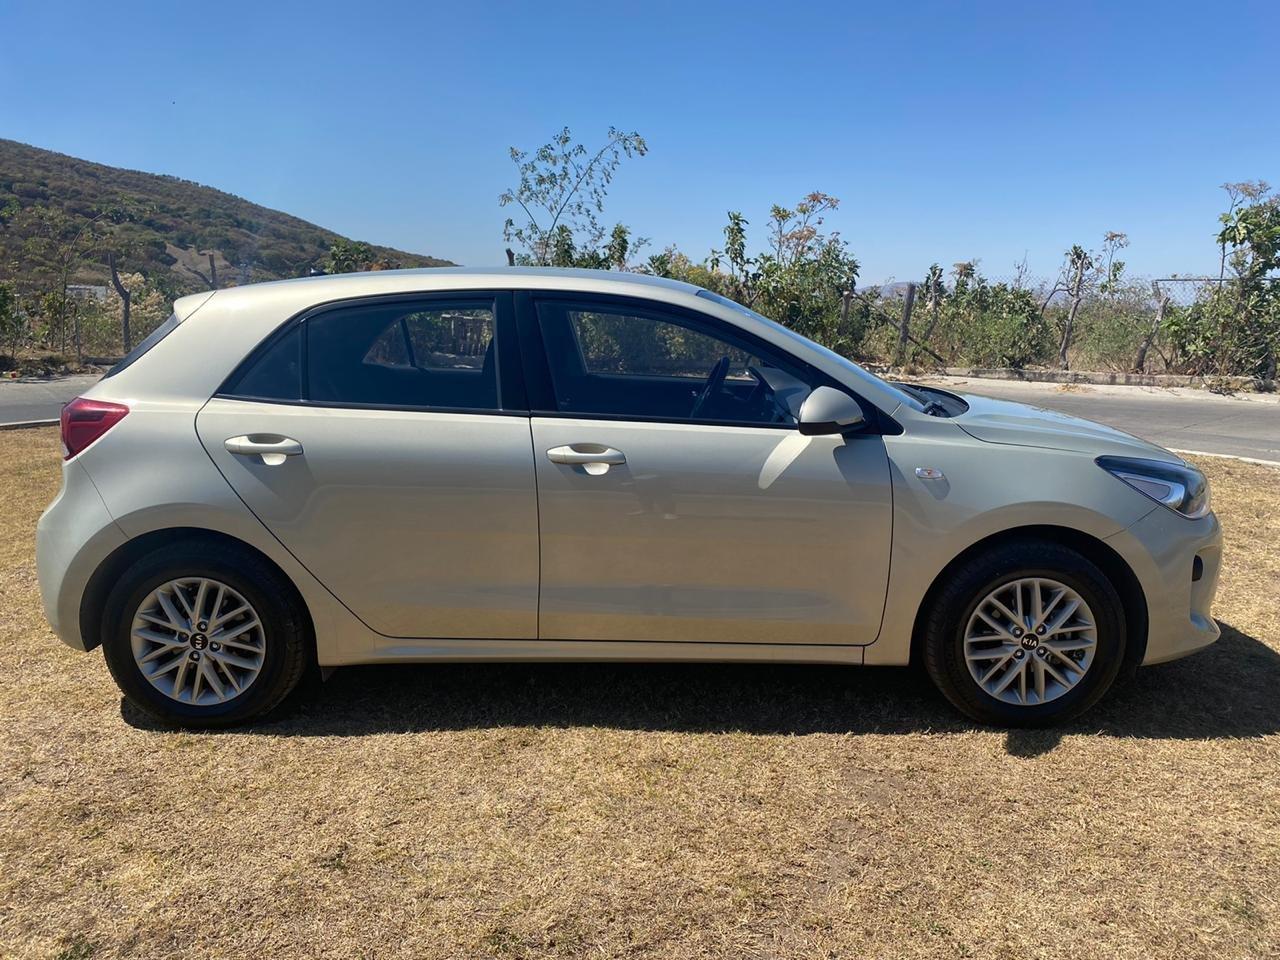 Kia Rio platino hatchback usados baratos